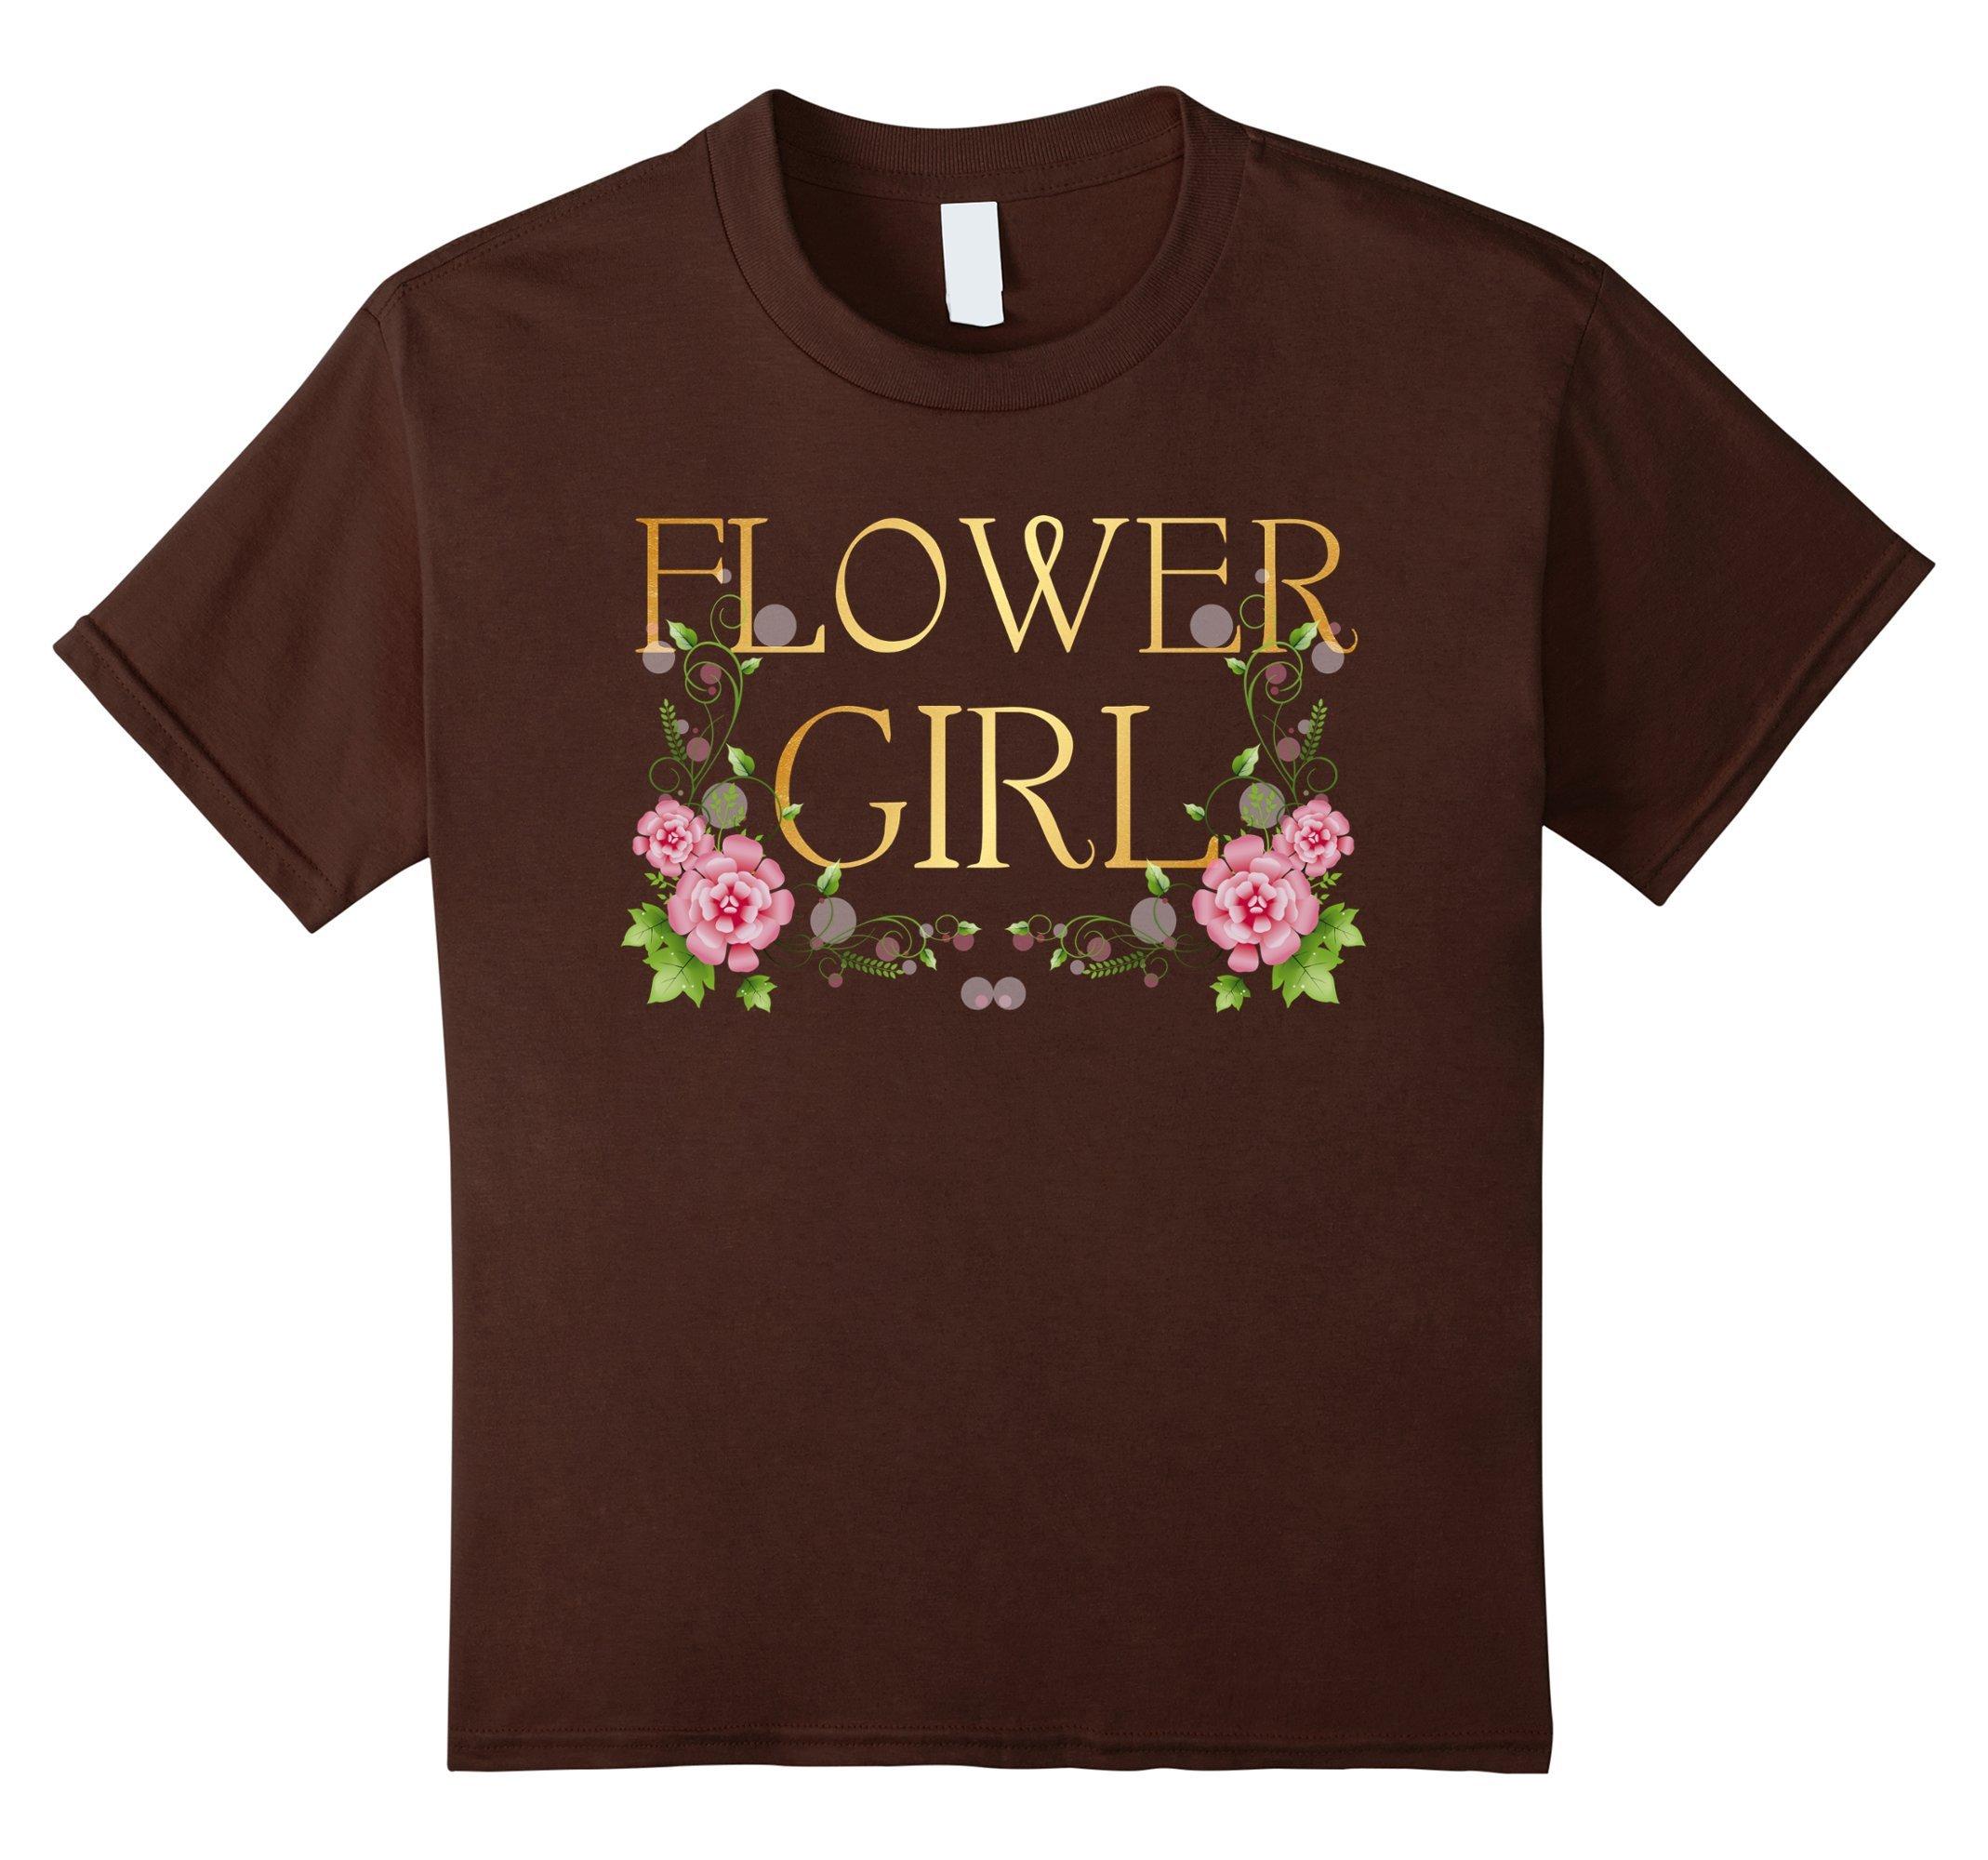 Kids Flower Girl Gold T-Shirt Glitter Printed Bridesmaid Wedding 10 Brown